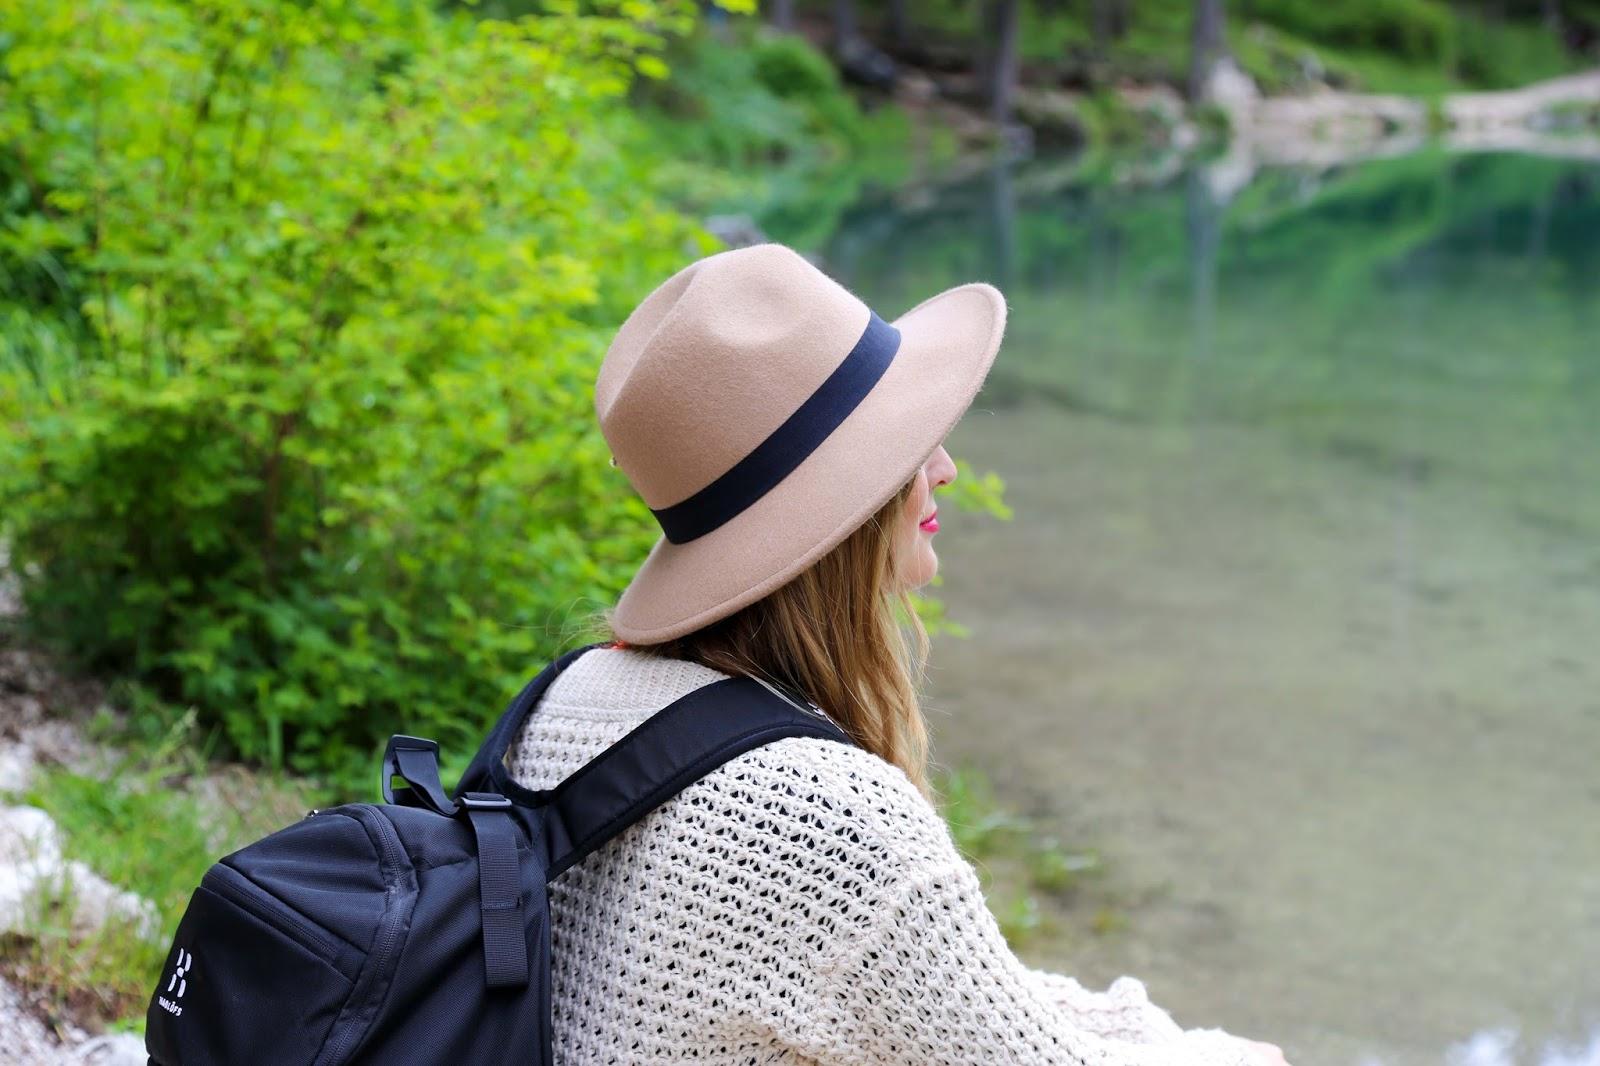 Fashionstylebyjohanna - Südtirol - Fedora Hut - Blogger - Austria - Outdoorblogger - Haglo-Pragser Wildsee- Outdoorblog - Austriablogger